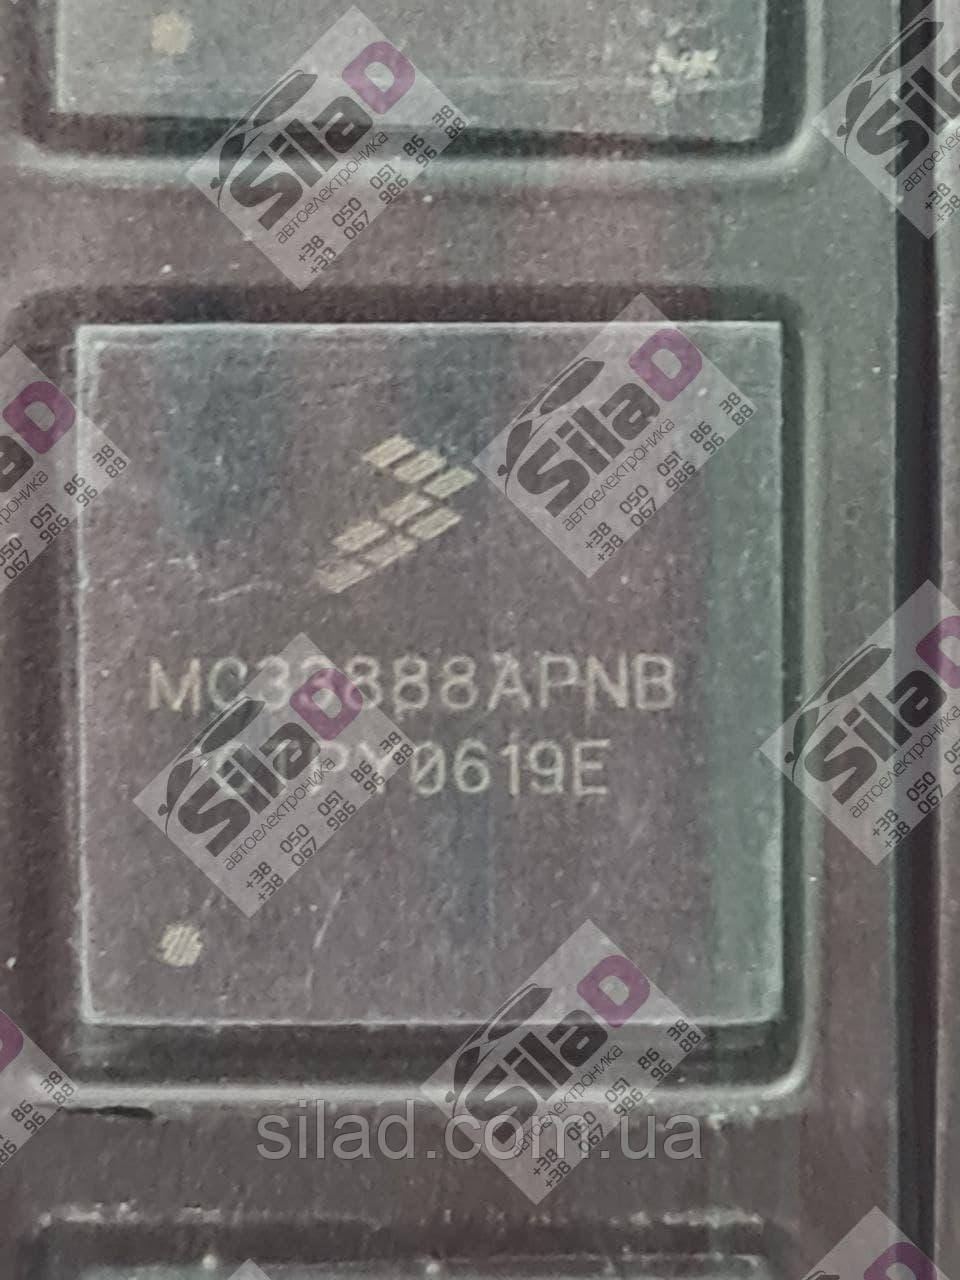 Микросхема MC33888PNB NXP Semiconductors корпус PQFN-36